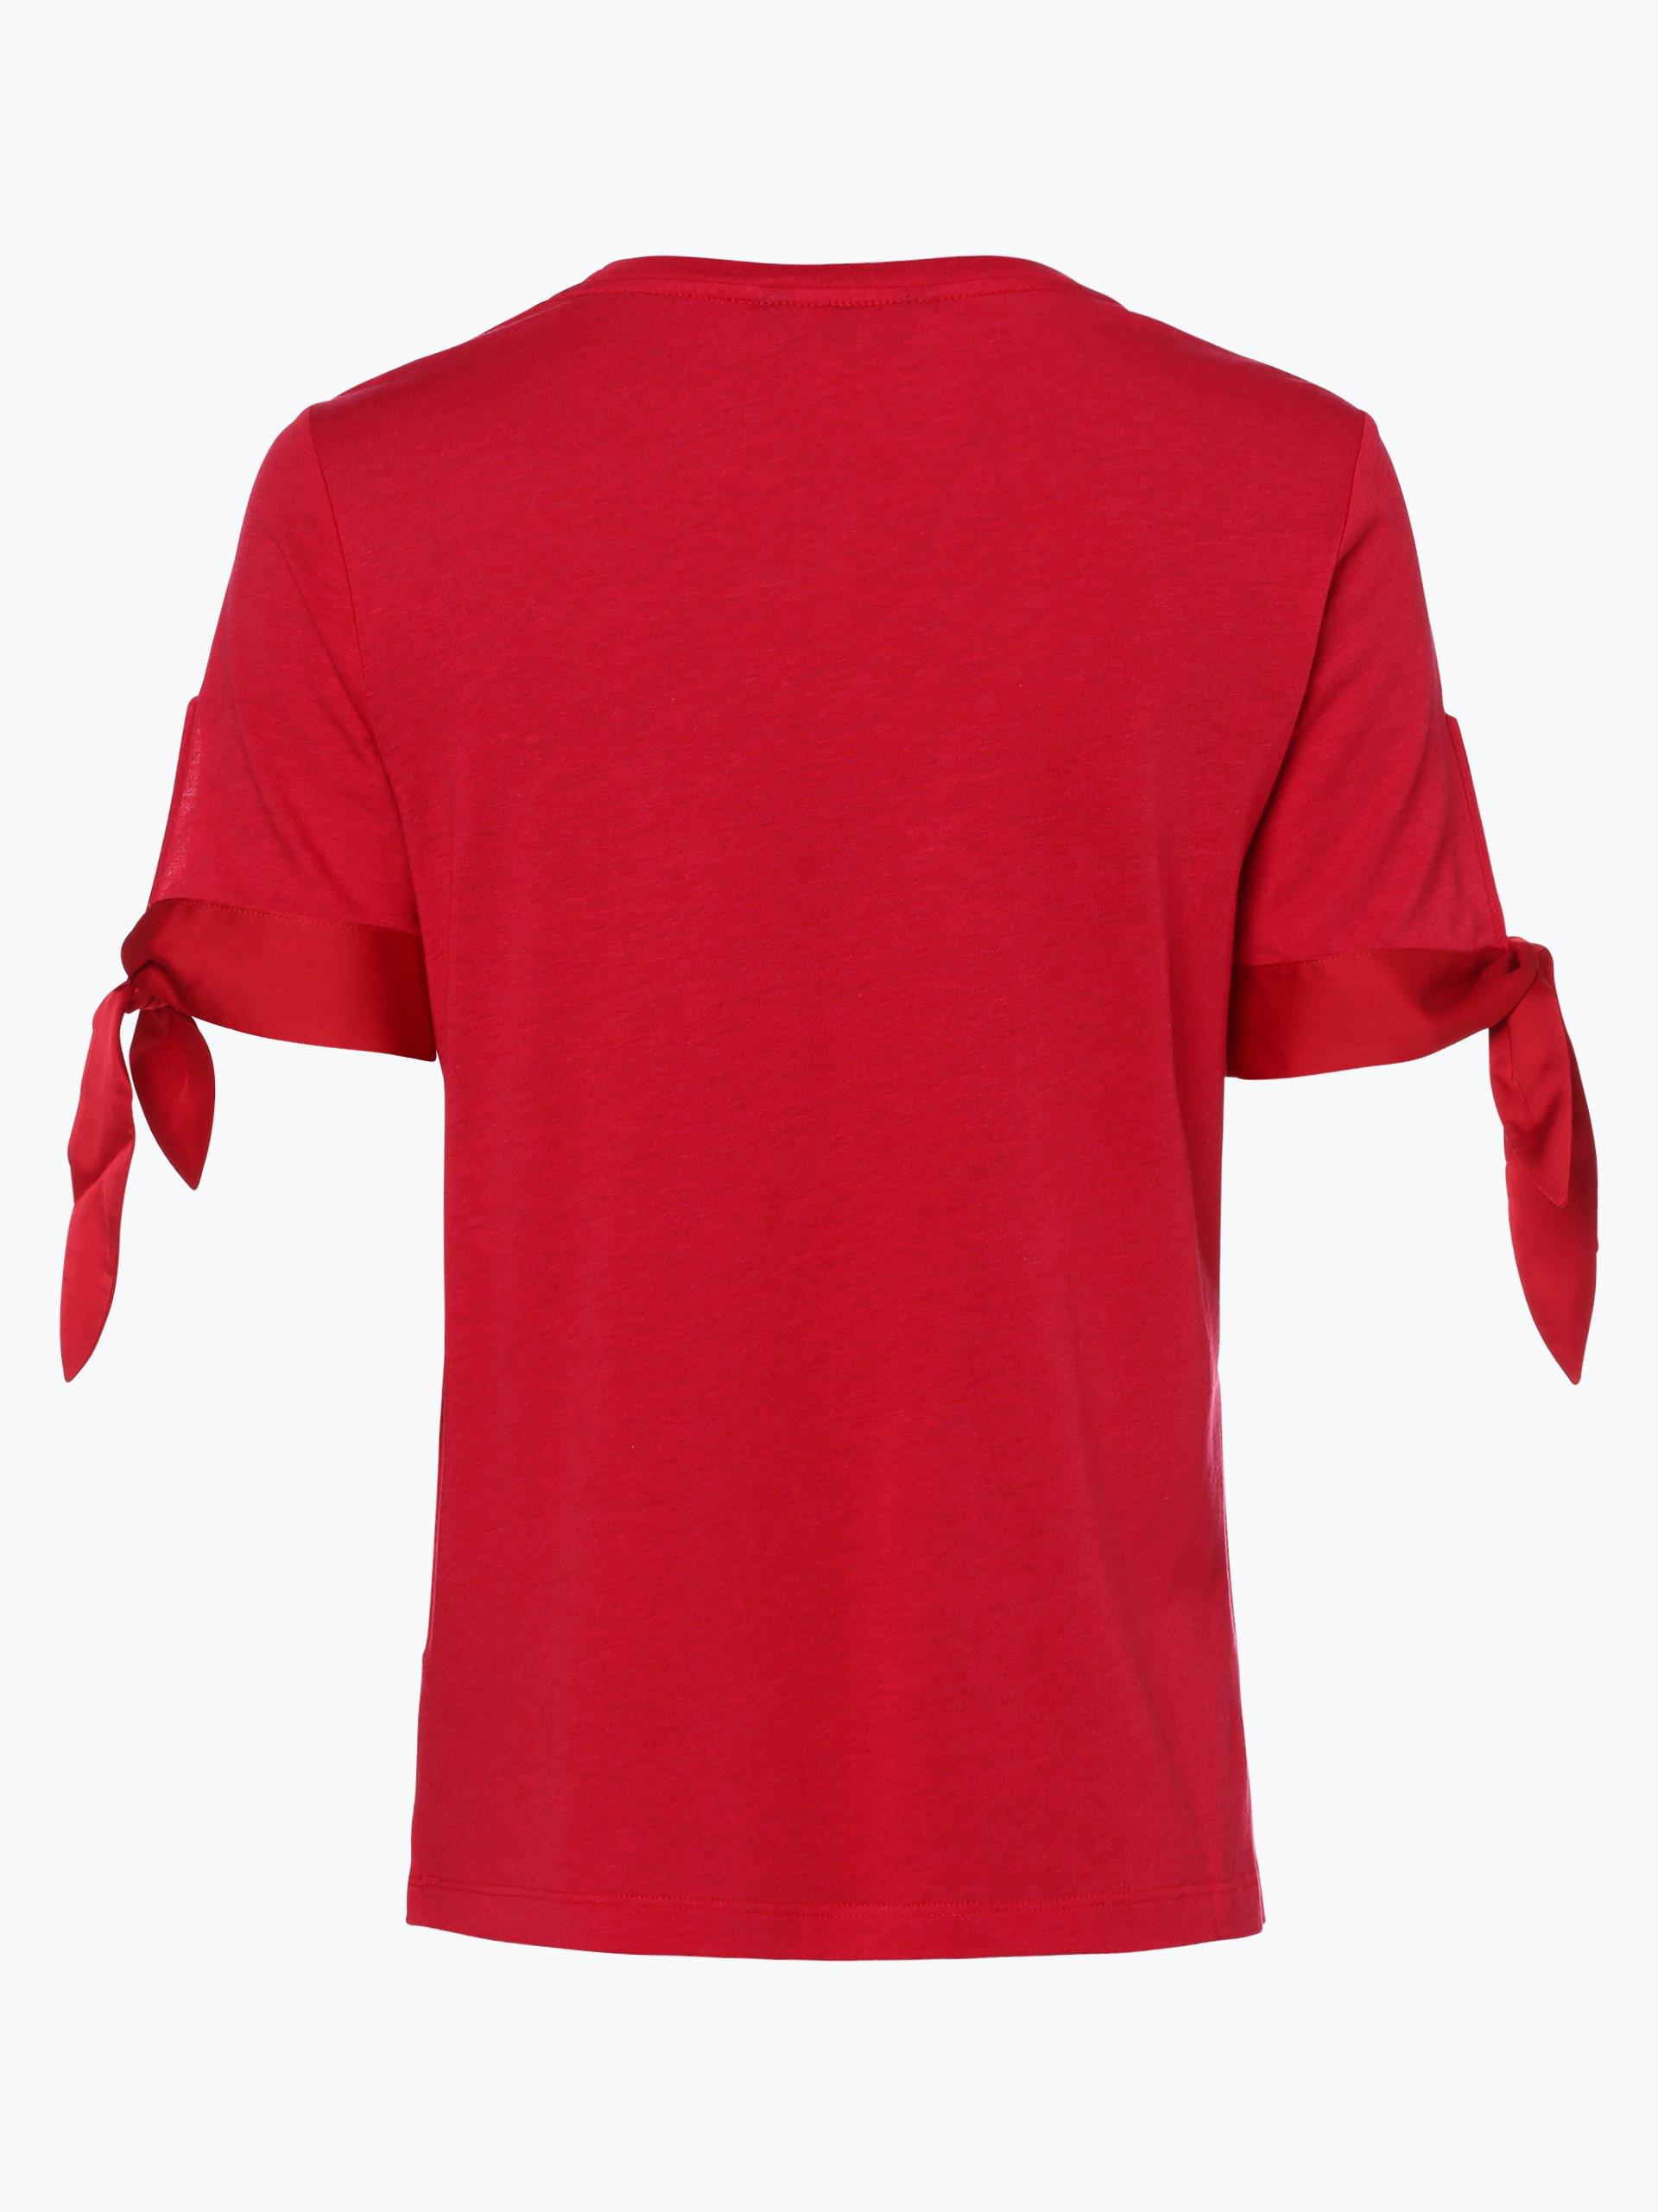 tommy hilfiger damen t shirt rot uni online kaufen peek. Black Bedroom Furniture Sets. Home Design Ideas